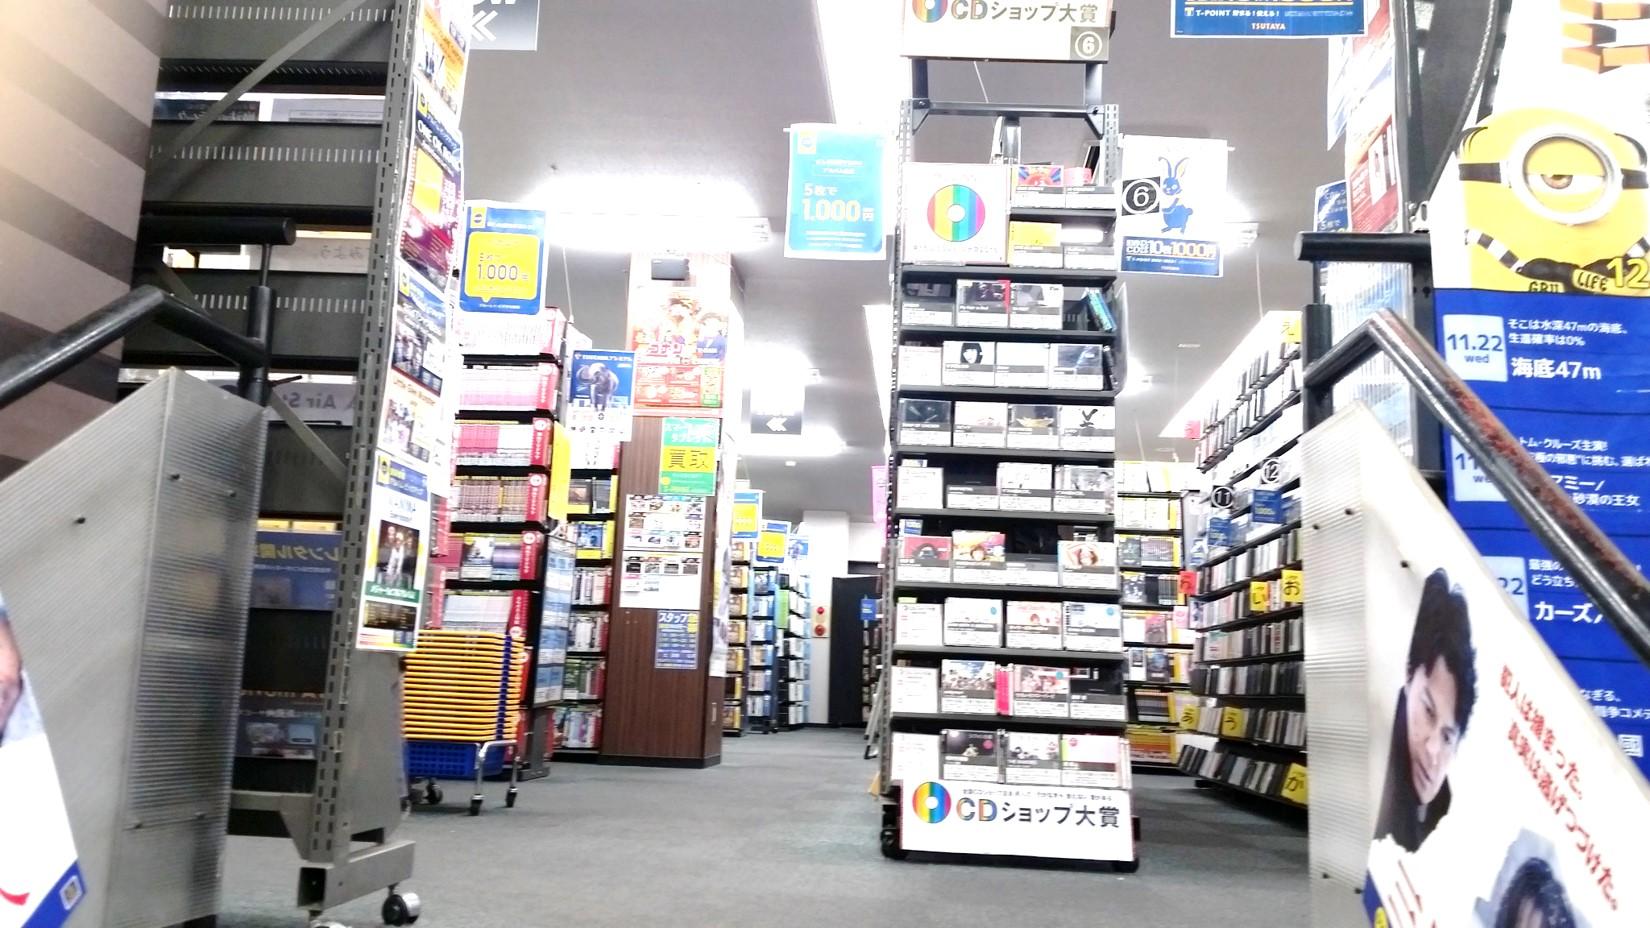 千川 TSUTAYA 2階